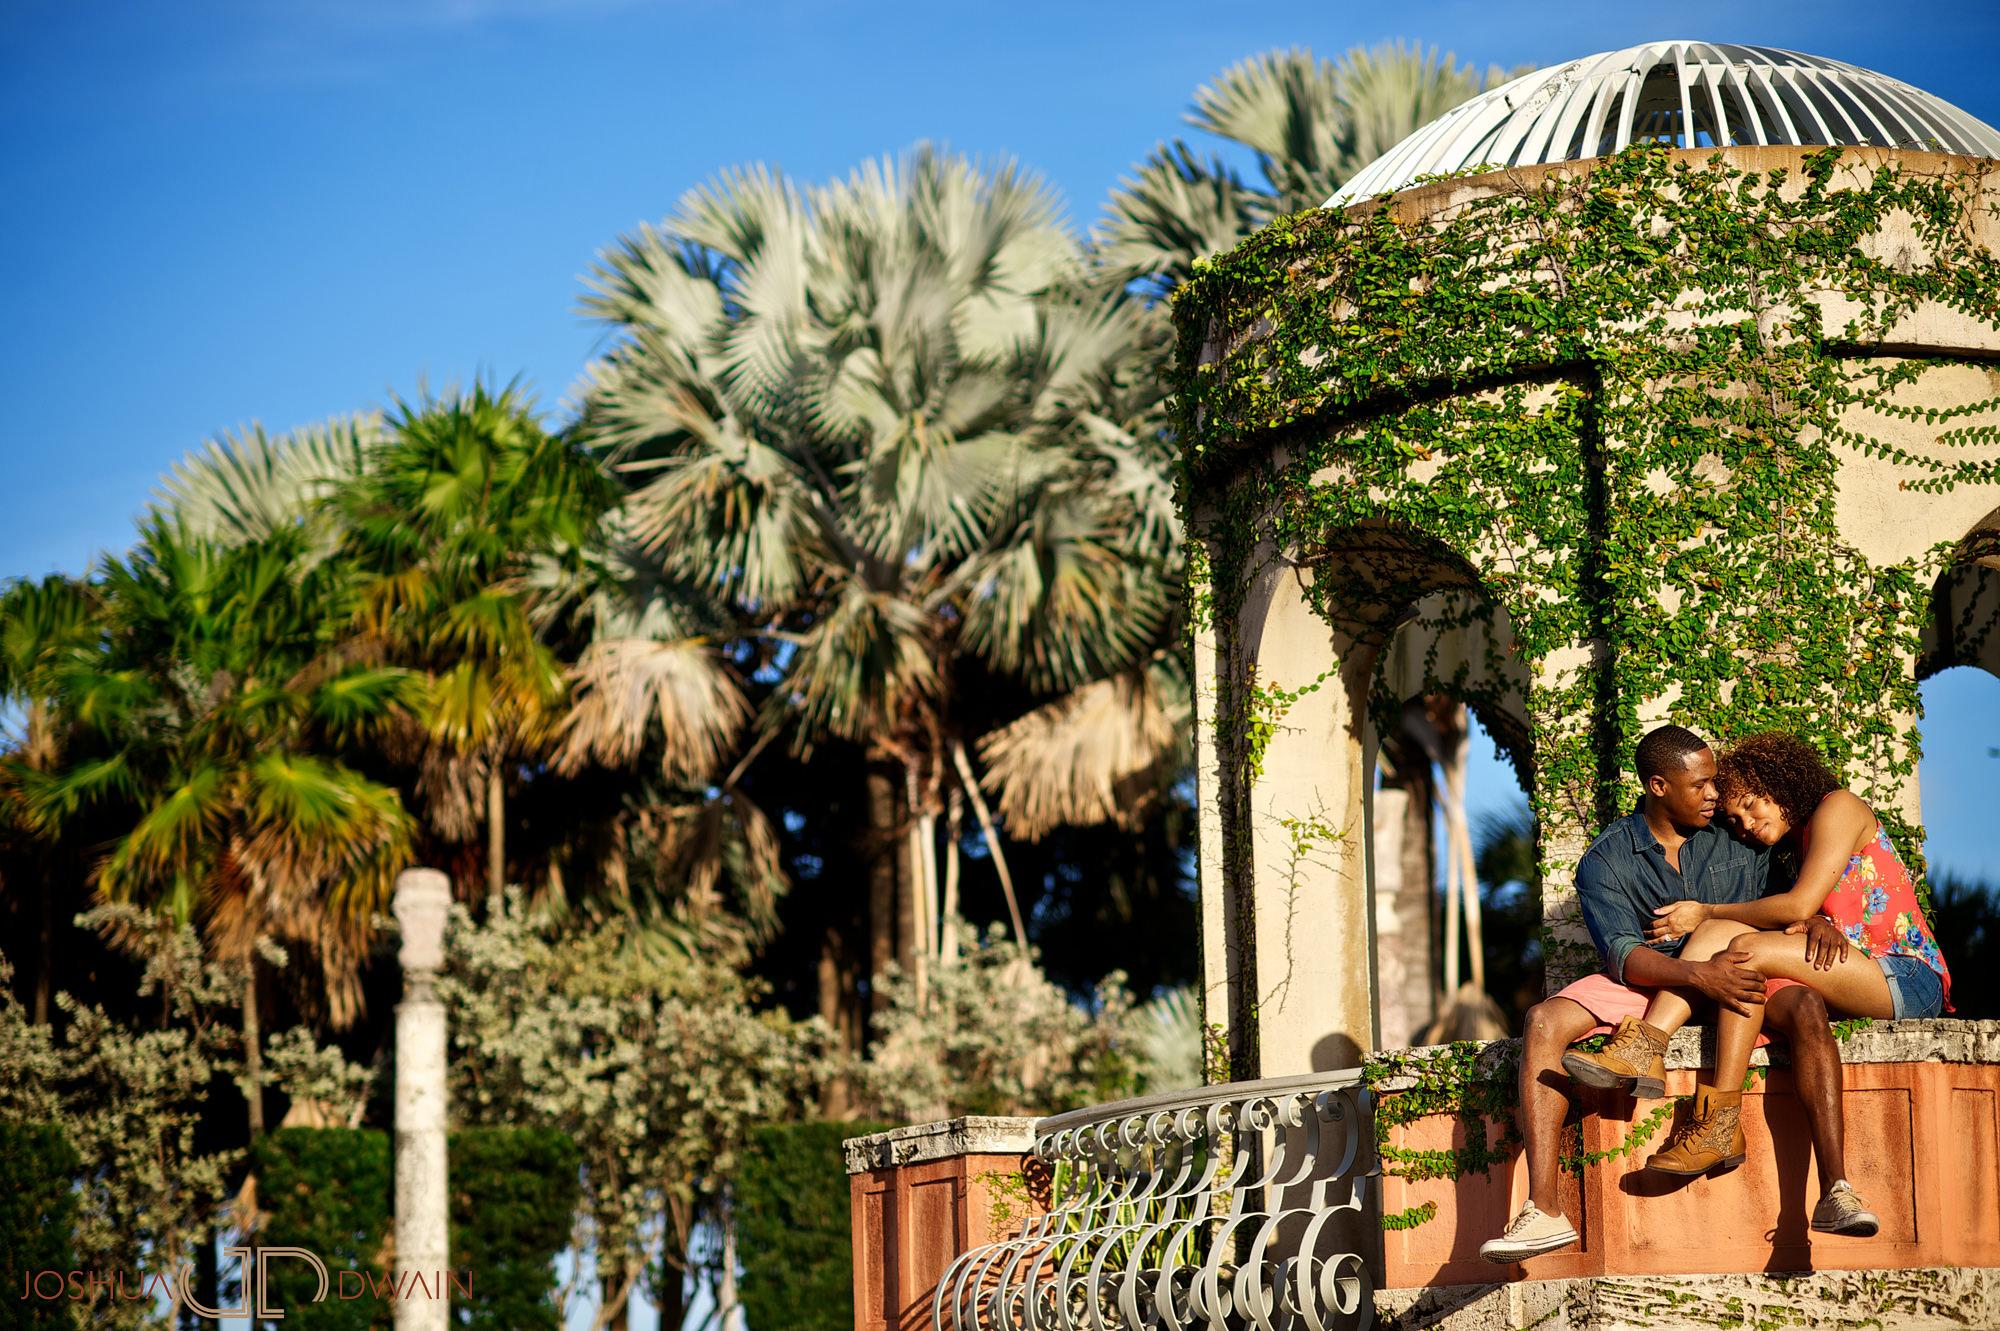 danielle-dowani-013-vizcaya-museum-gardens-miami-florida-wedding-photographer-joshua-dwain